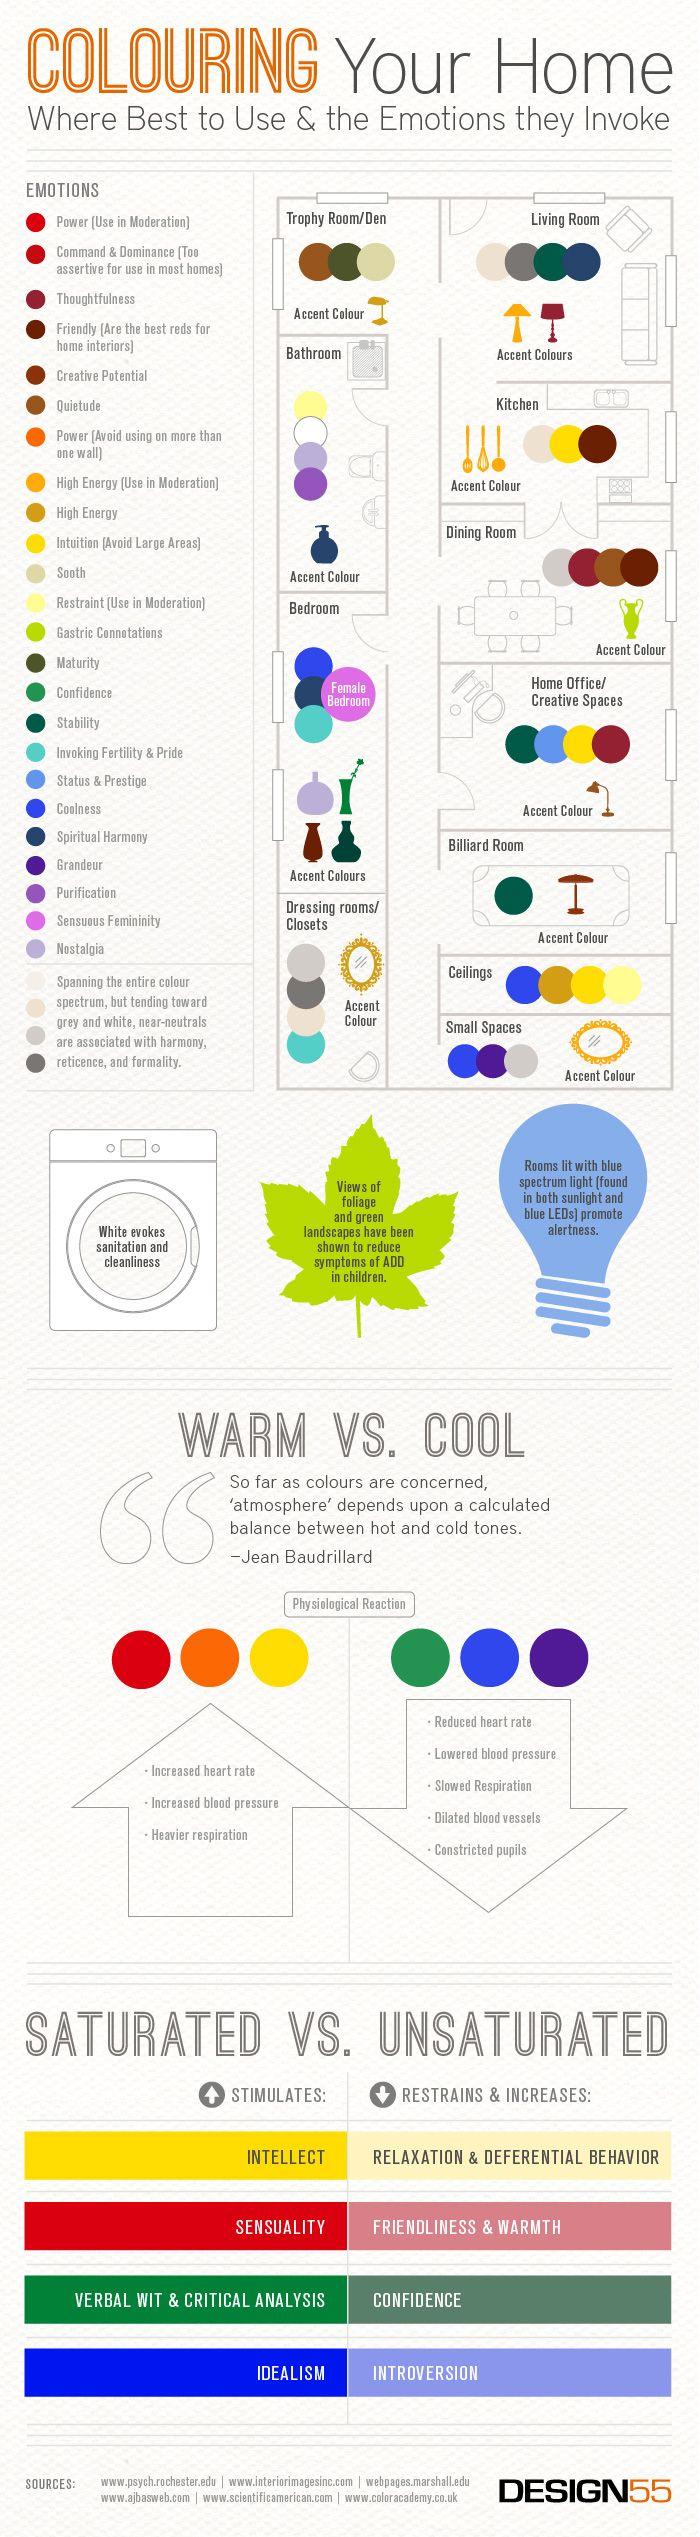 Fantasic Color guide!! #complex #convivial